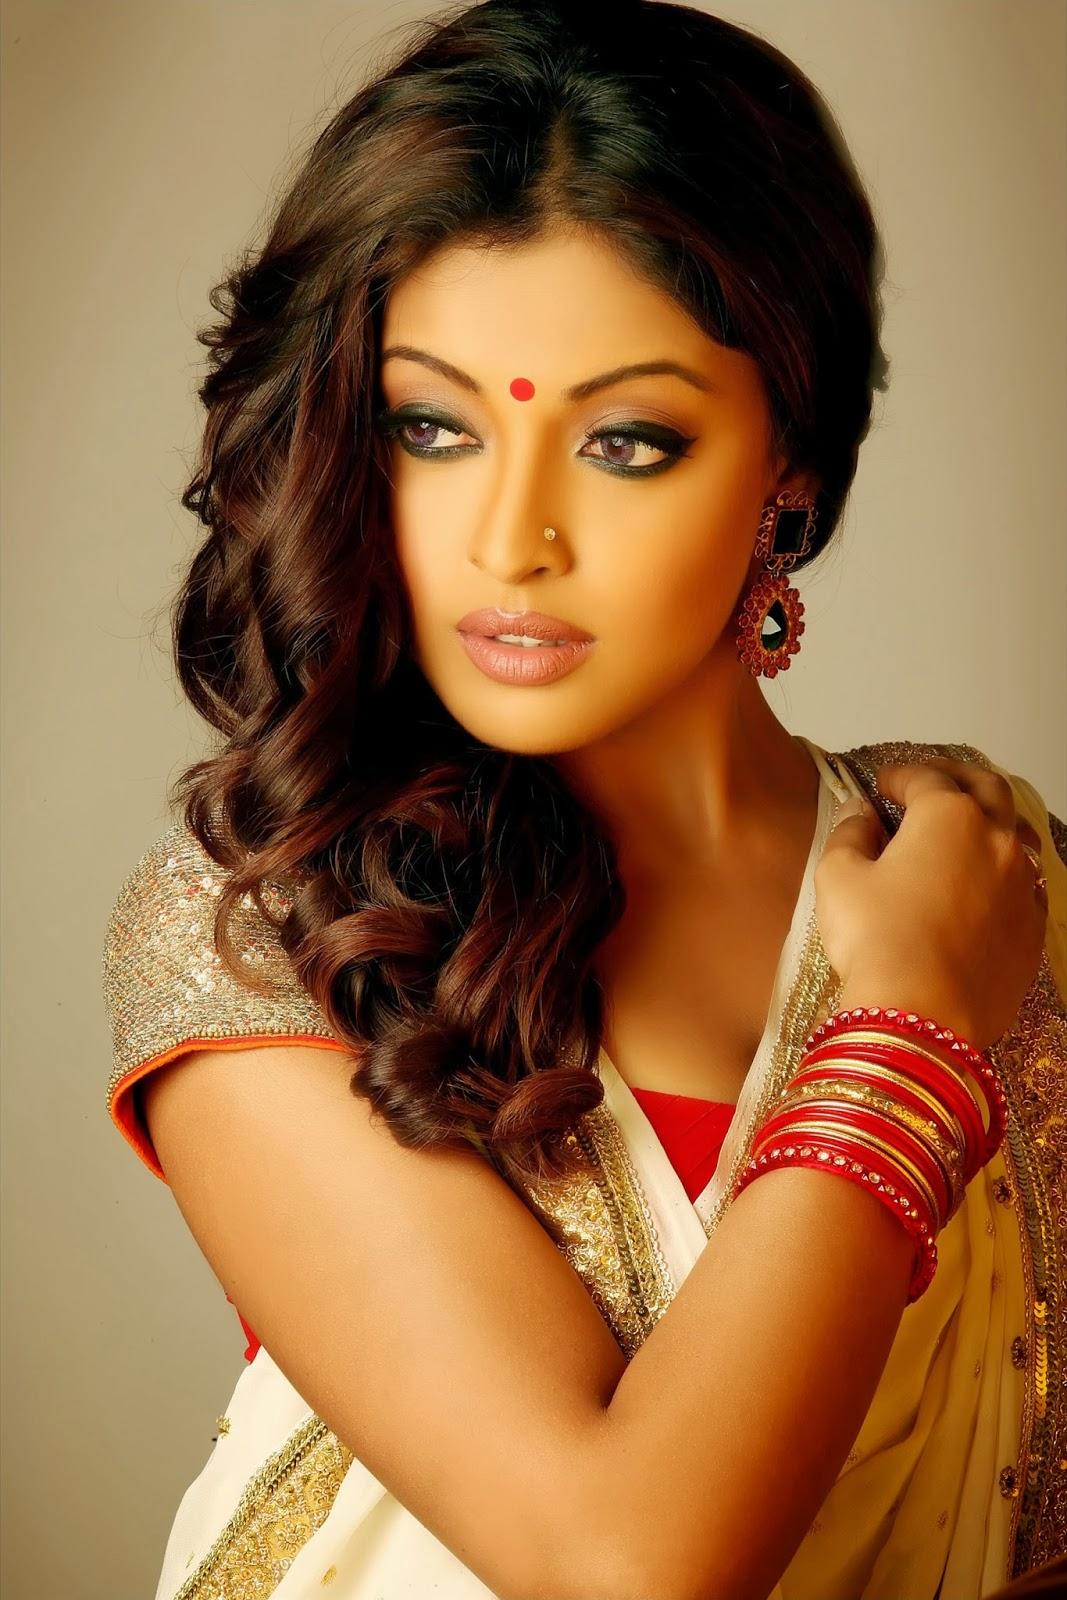 Parineeti Chopra Wallpaper 3d Celebrity Photo Gallery Tanushree Dutta